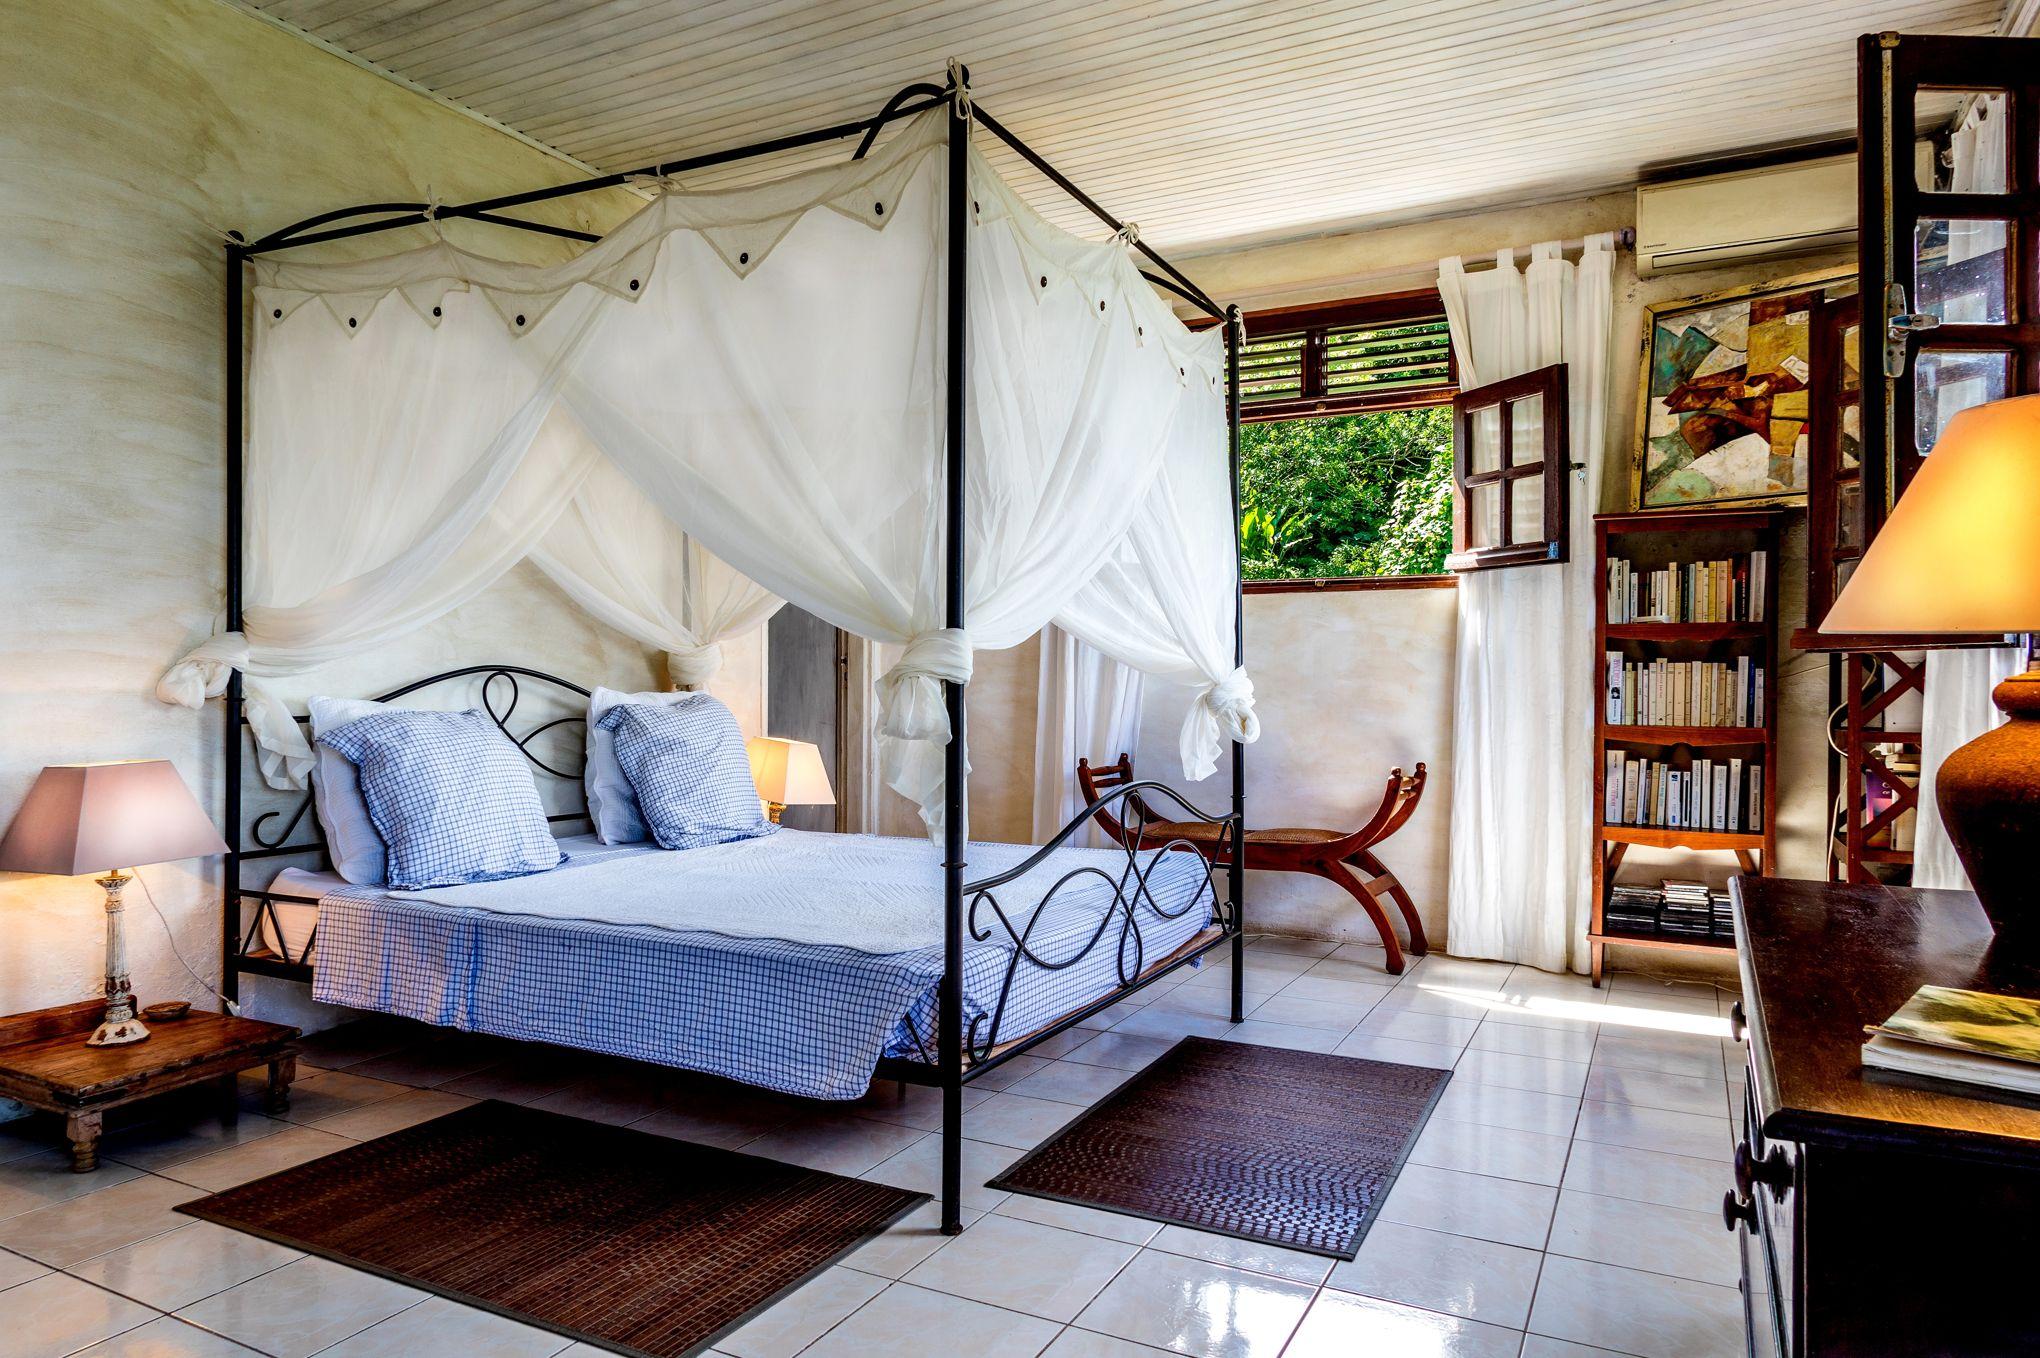 nos plus belles chambres d 39 h tes dans les dom tom. Black Bedroom Furniture Sets. Home Design Ideas